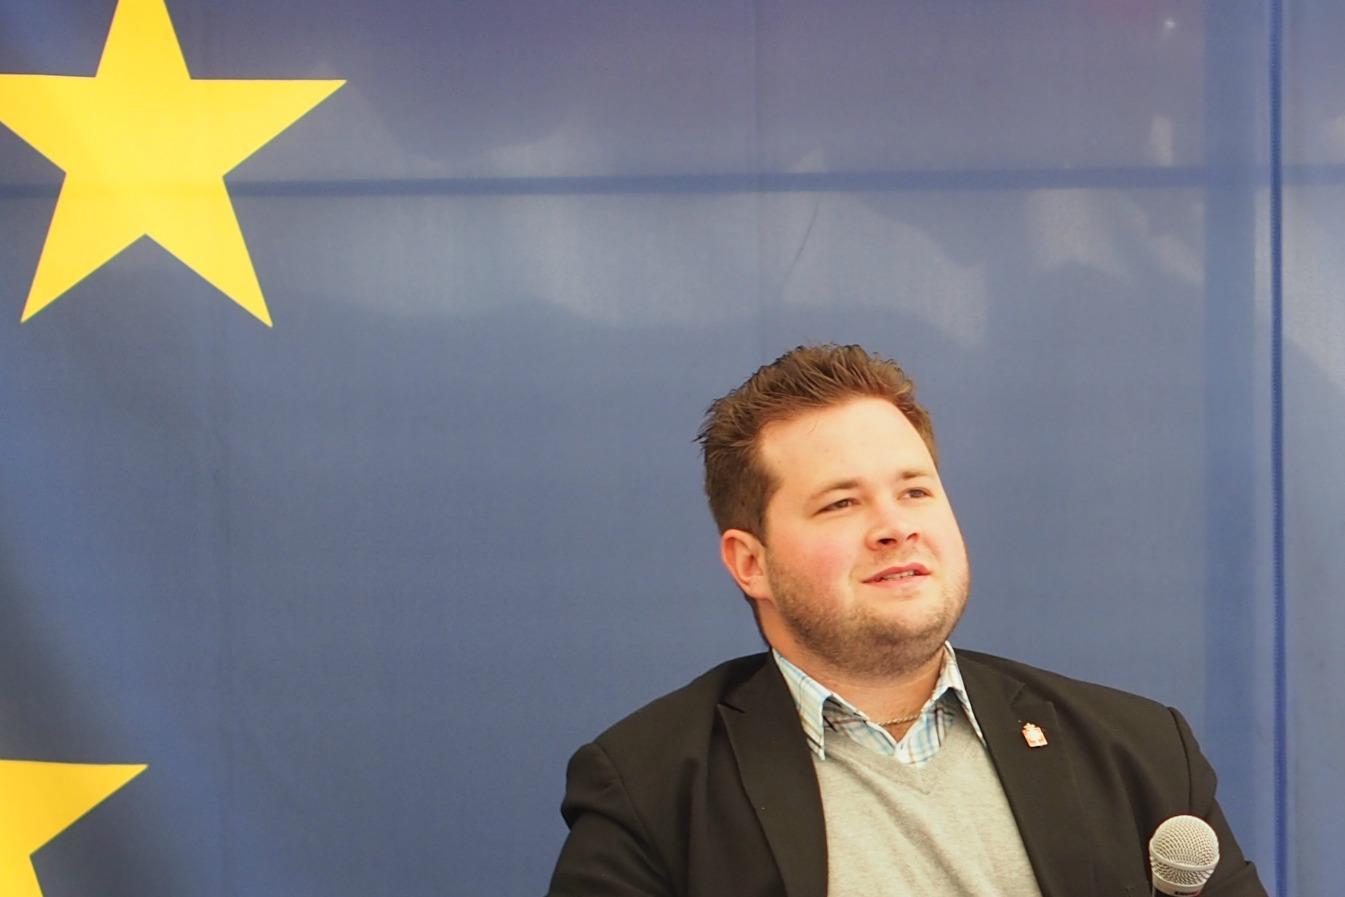 Anders Primdahl Vistisen [Europa-Parlamentet i Danmark/Flickr]